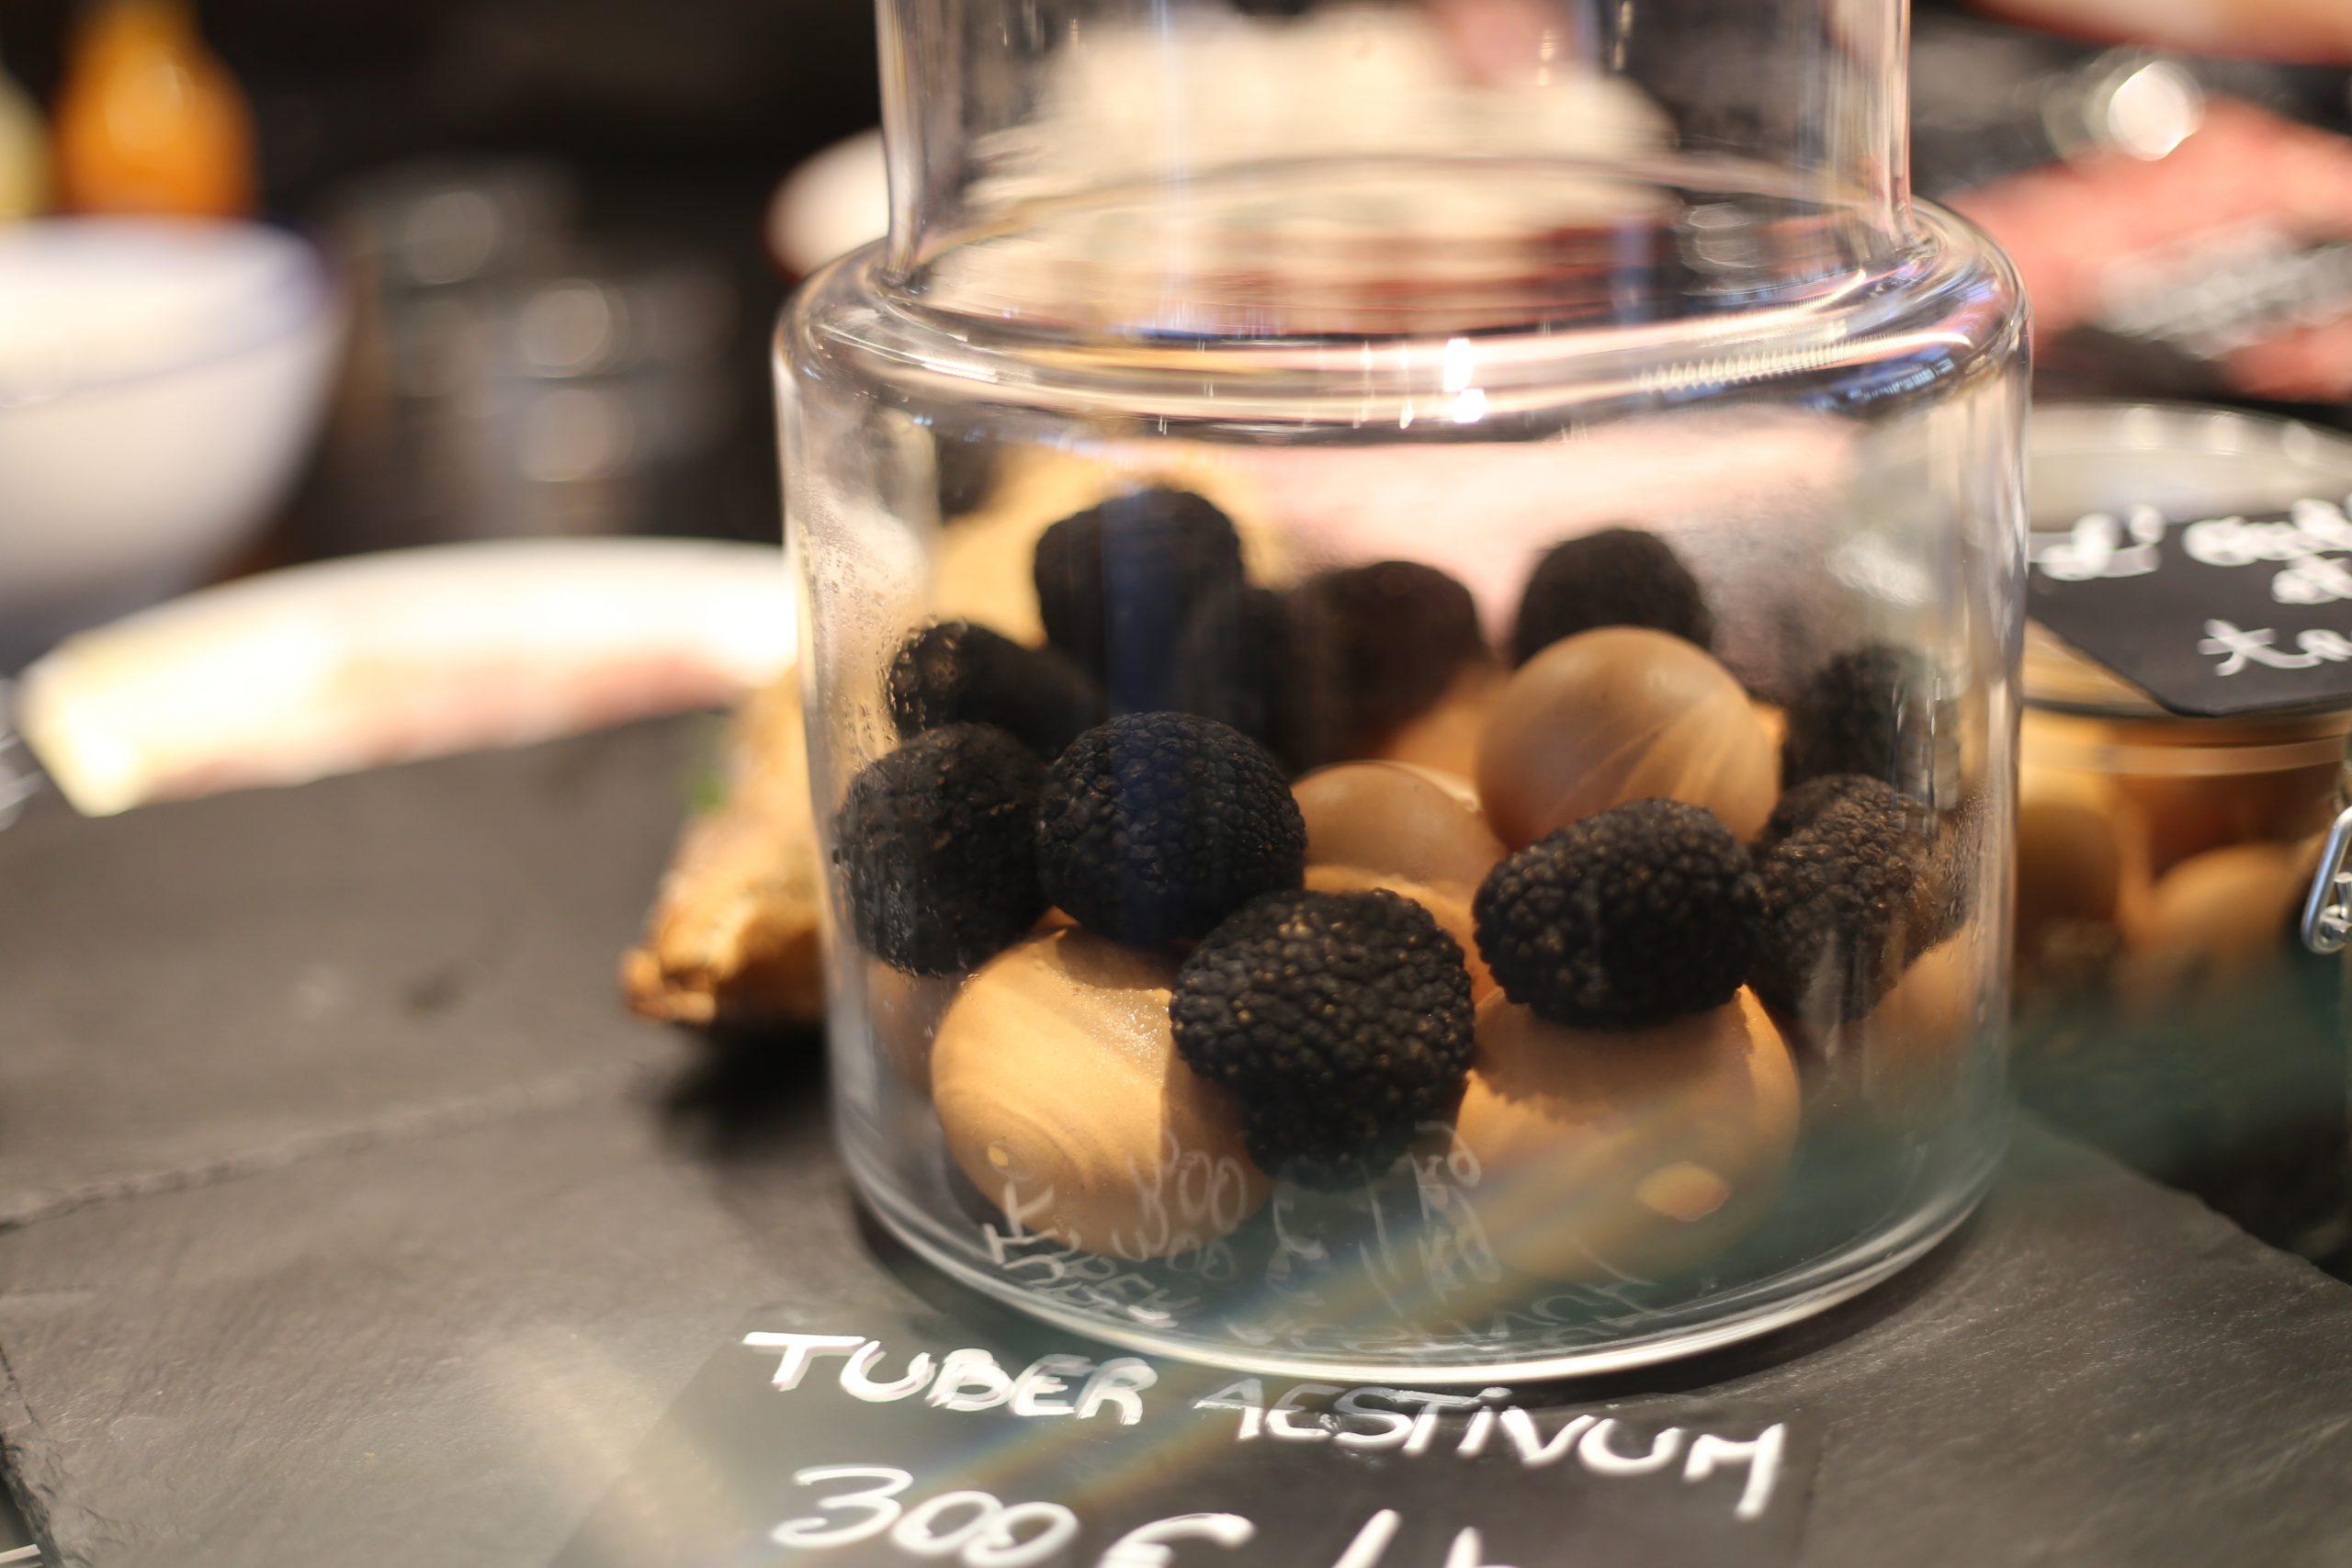 Storing Fresh Truffles with Eggs in Jar